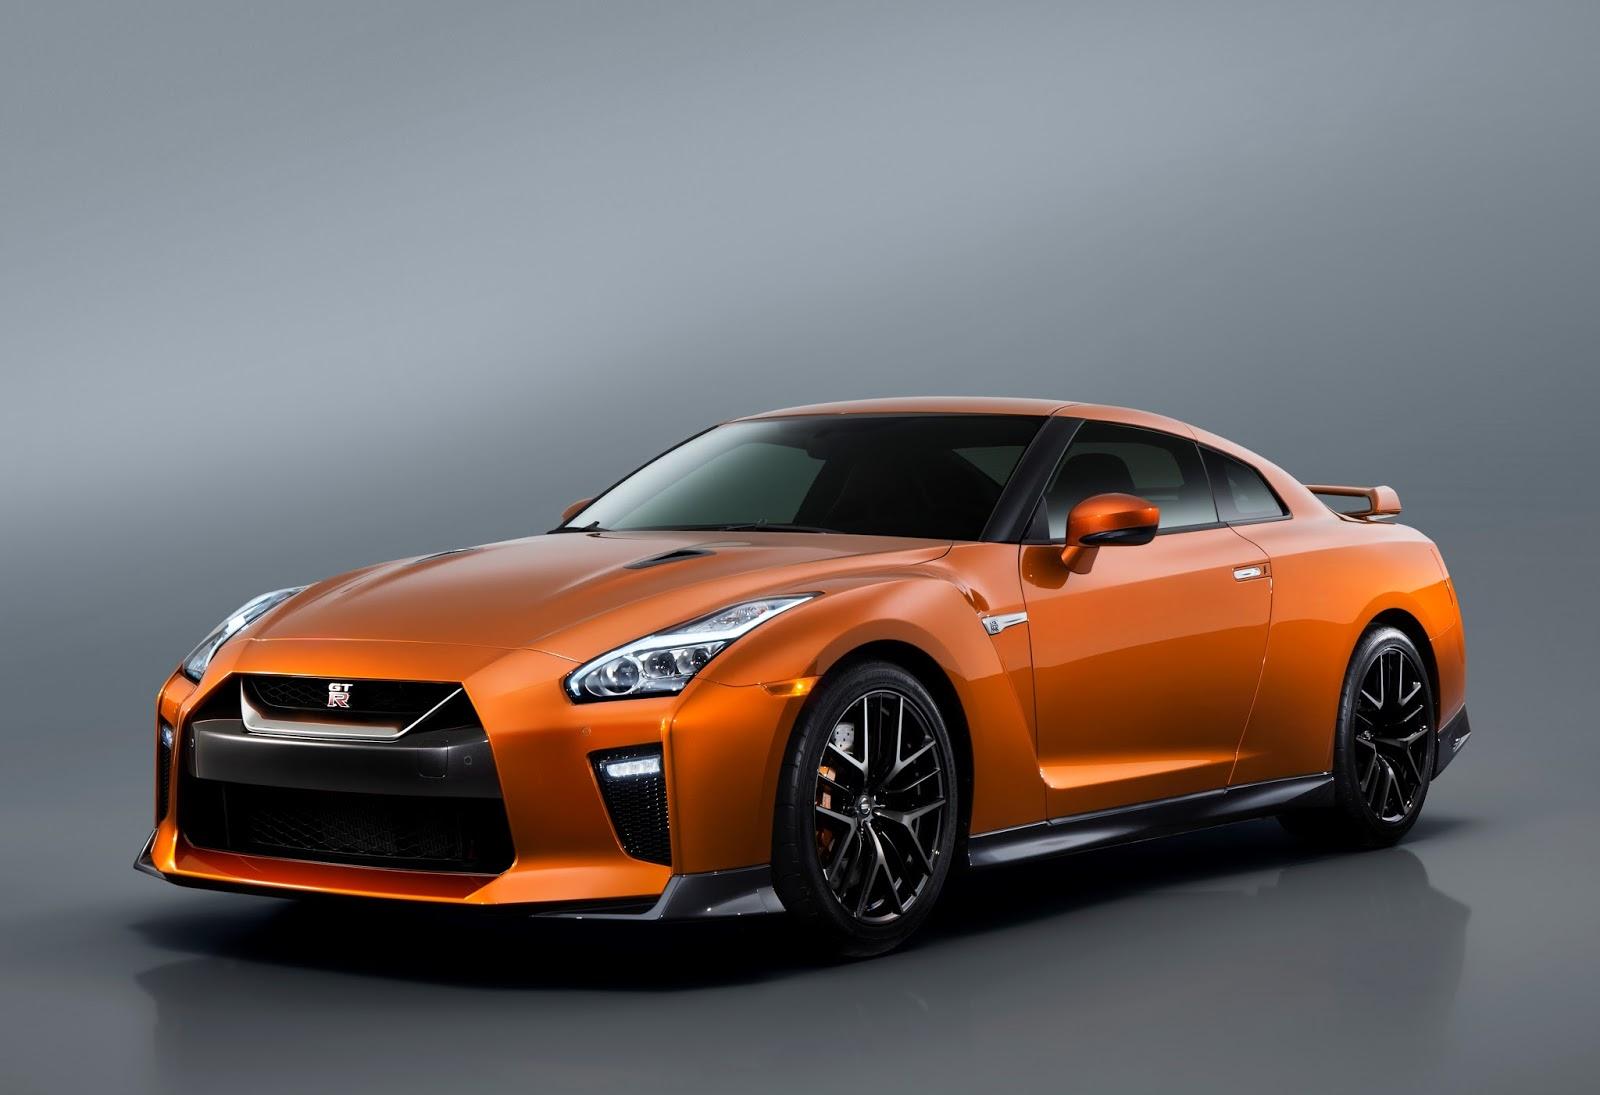 144061 1 5 Nissan GT-R: Ο Godzilla επέστρεψε! Godzilla, Nissan, Nissan GT-R, supercars, έκθεση Νέας Υόρκης